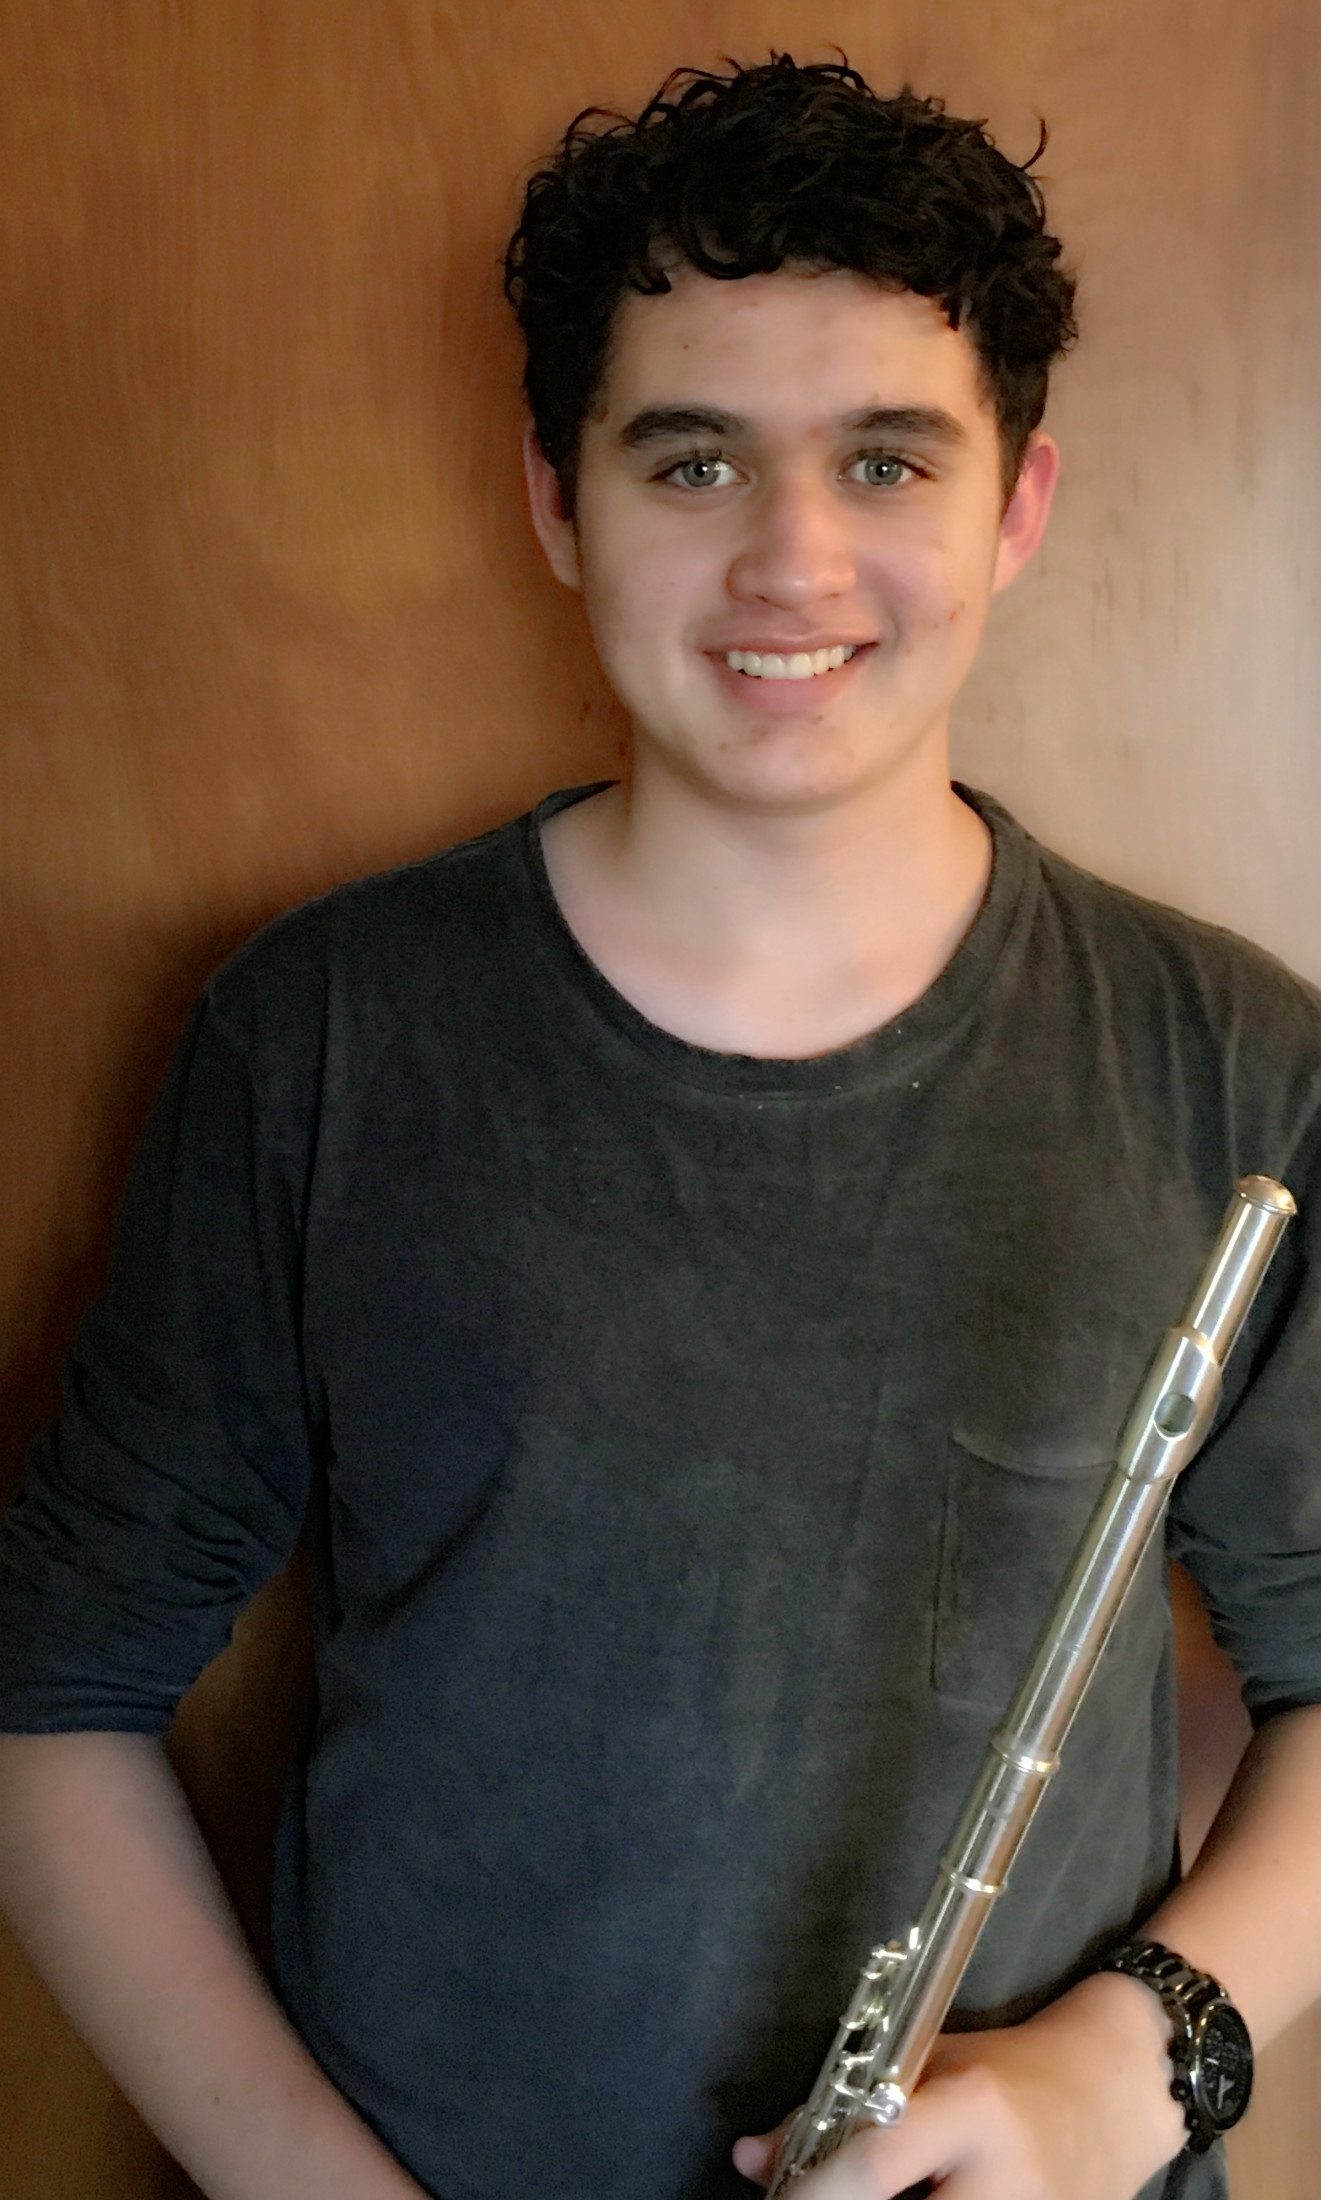 Micah Sullivan